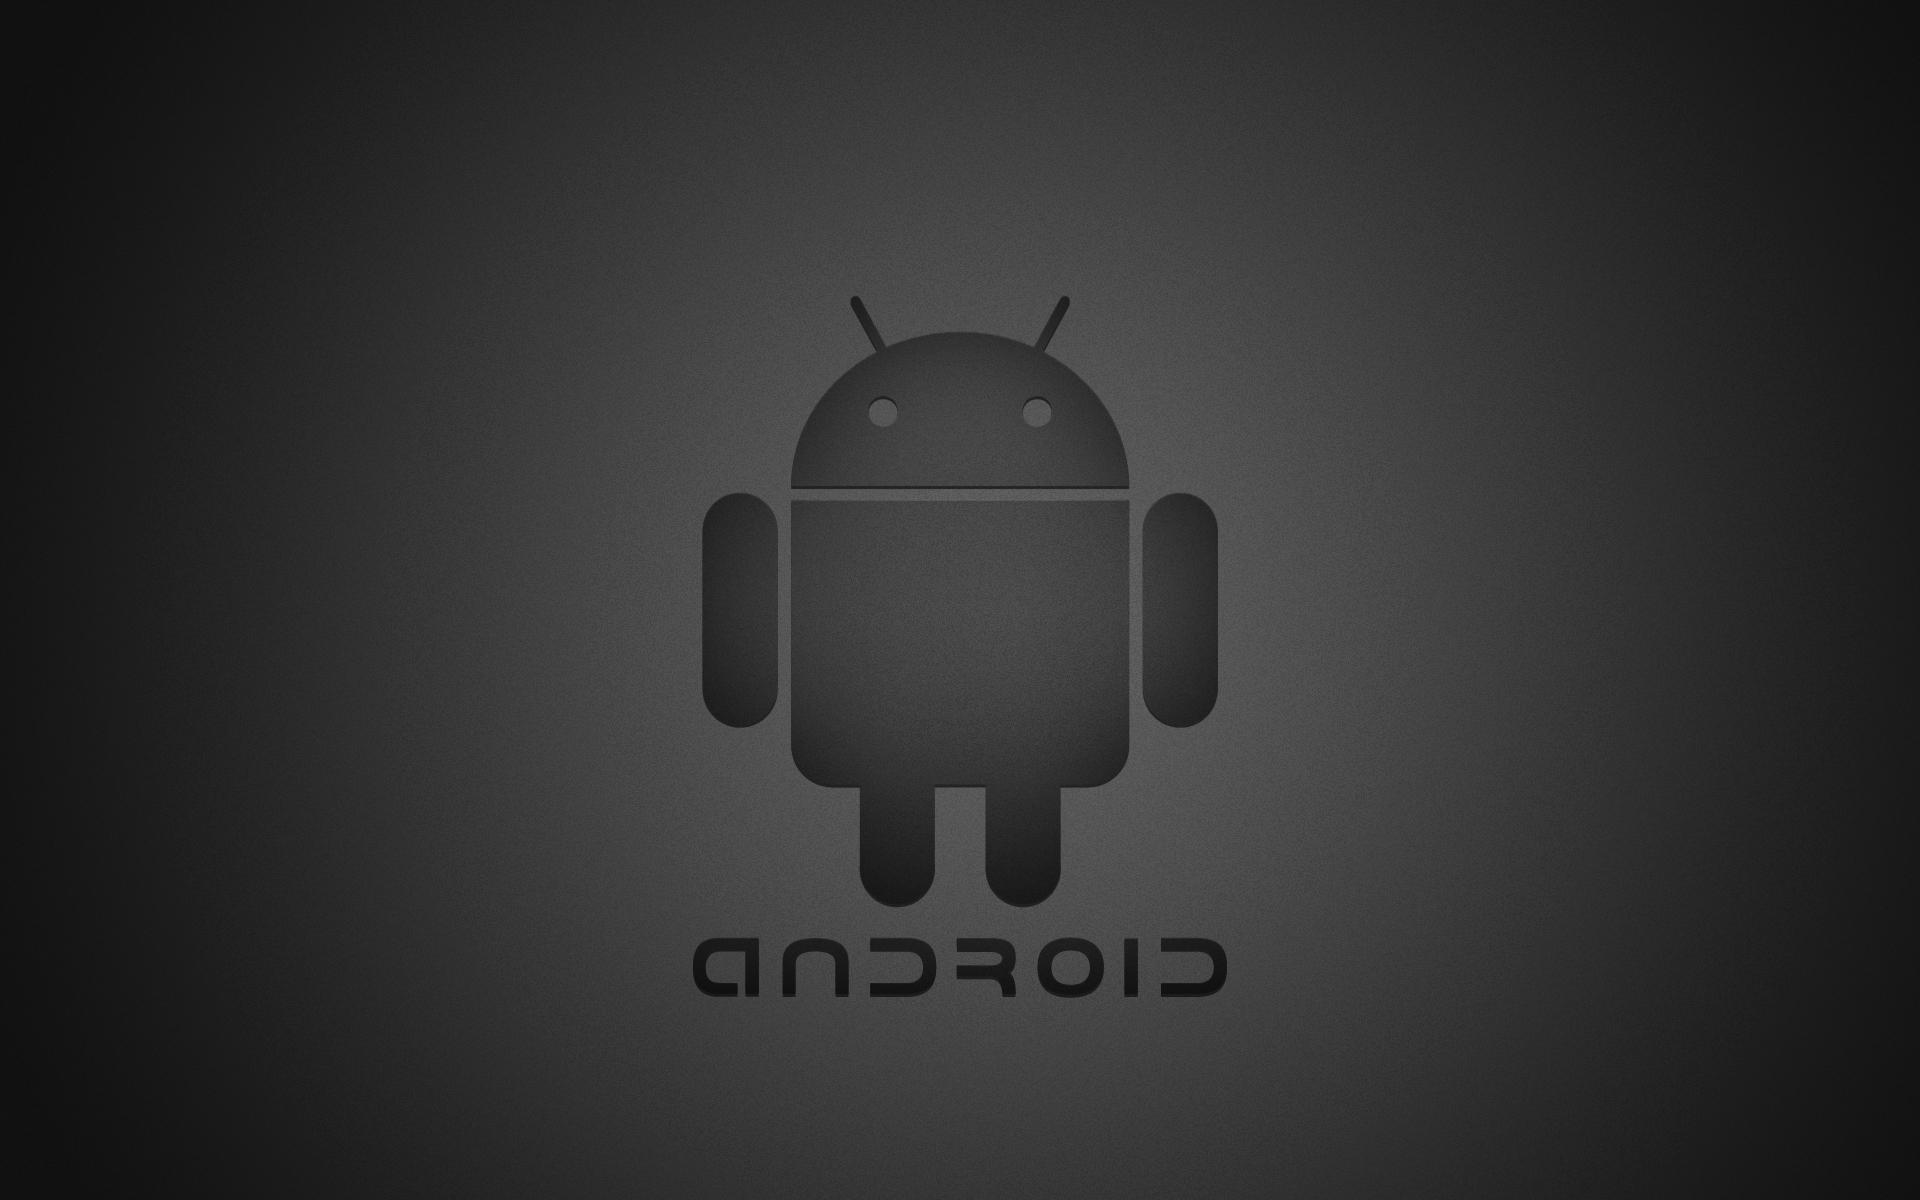 26418d1271837589 android desktop wallpaper androidjpg 1920x1200